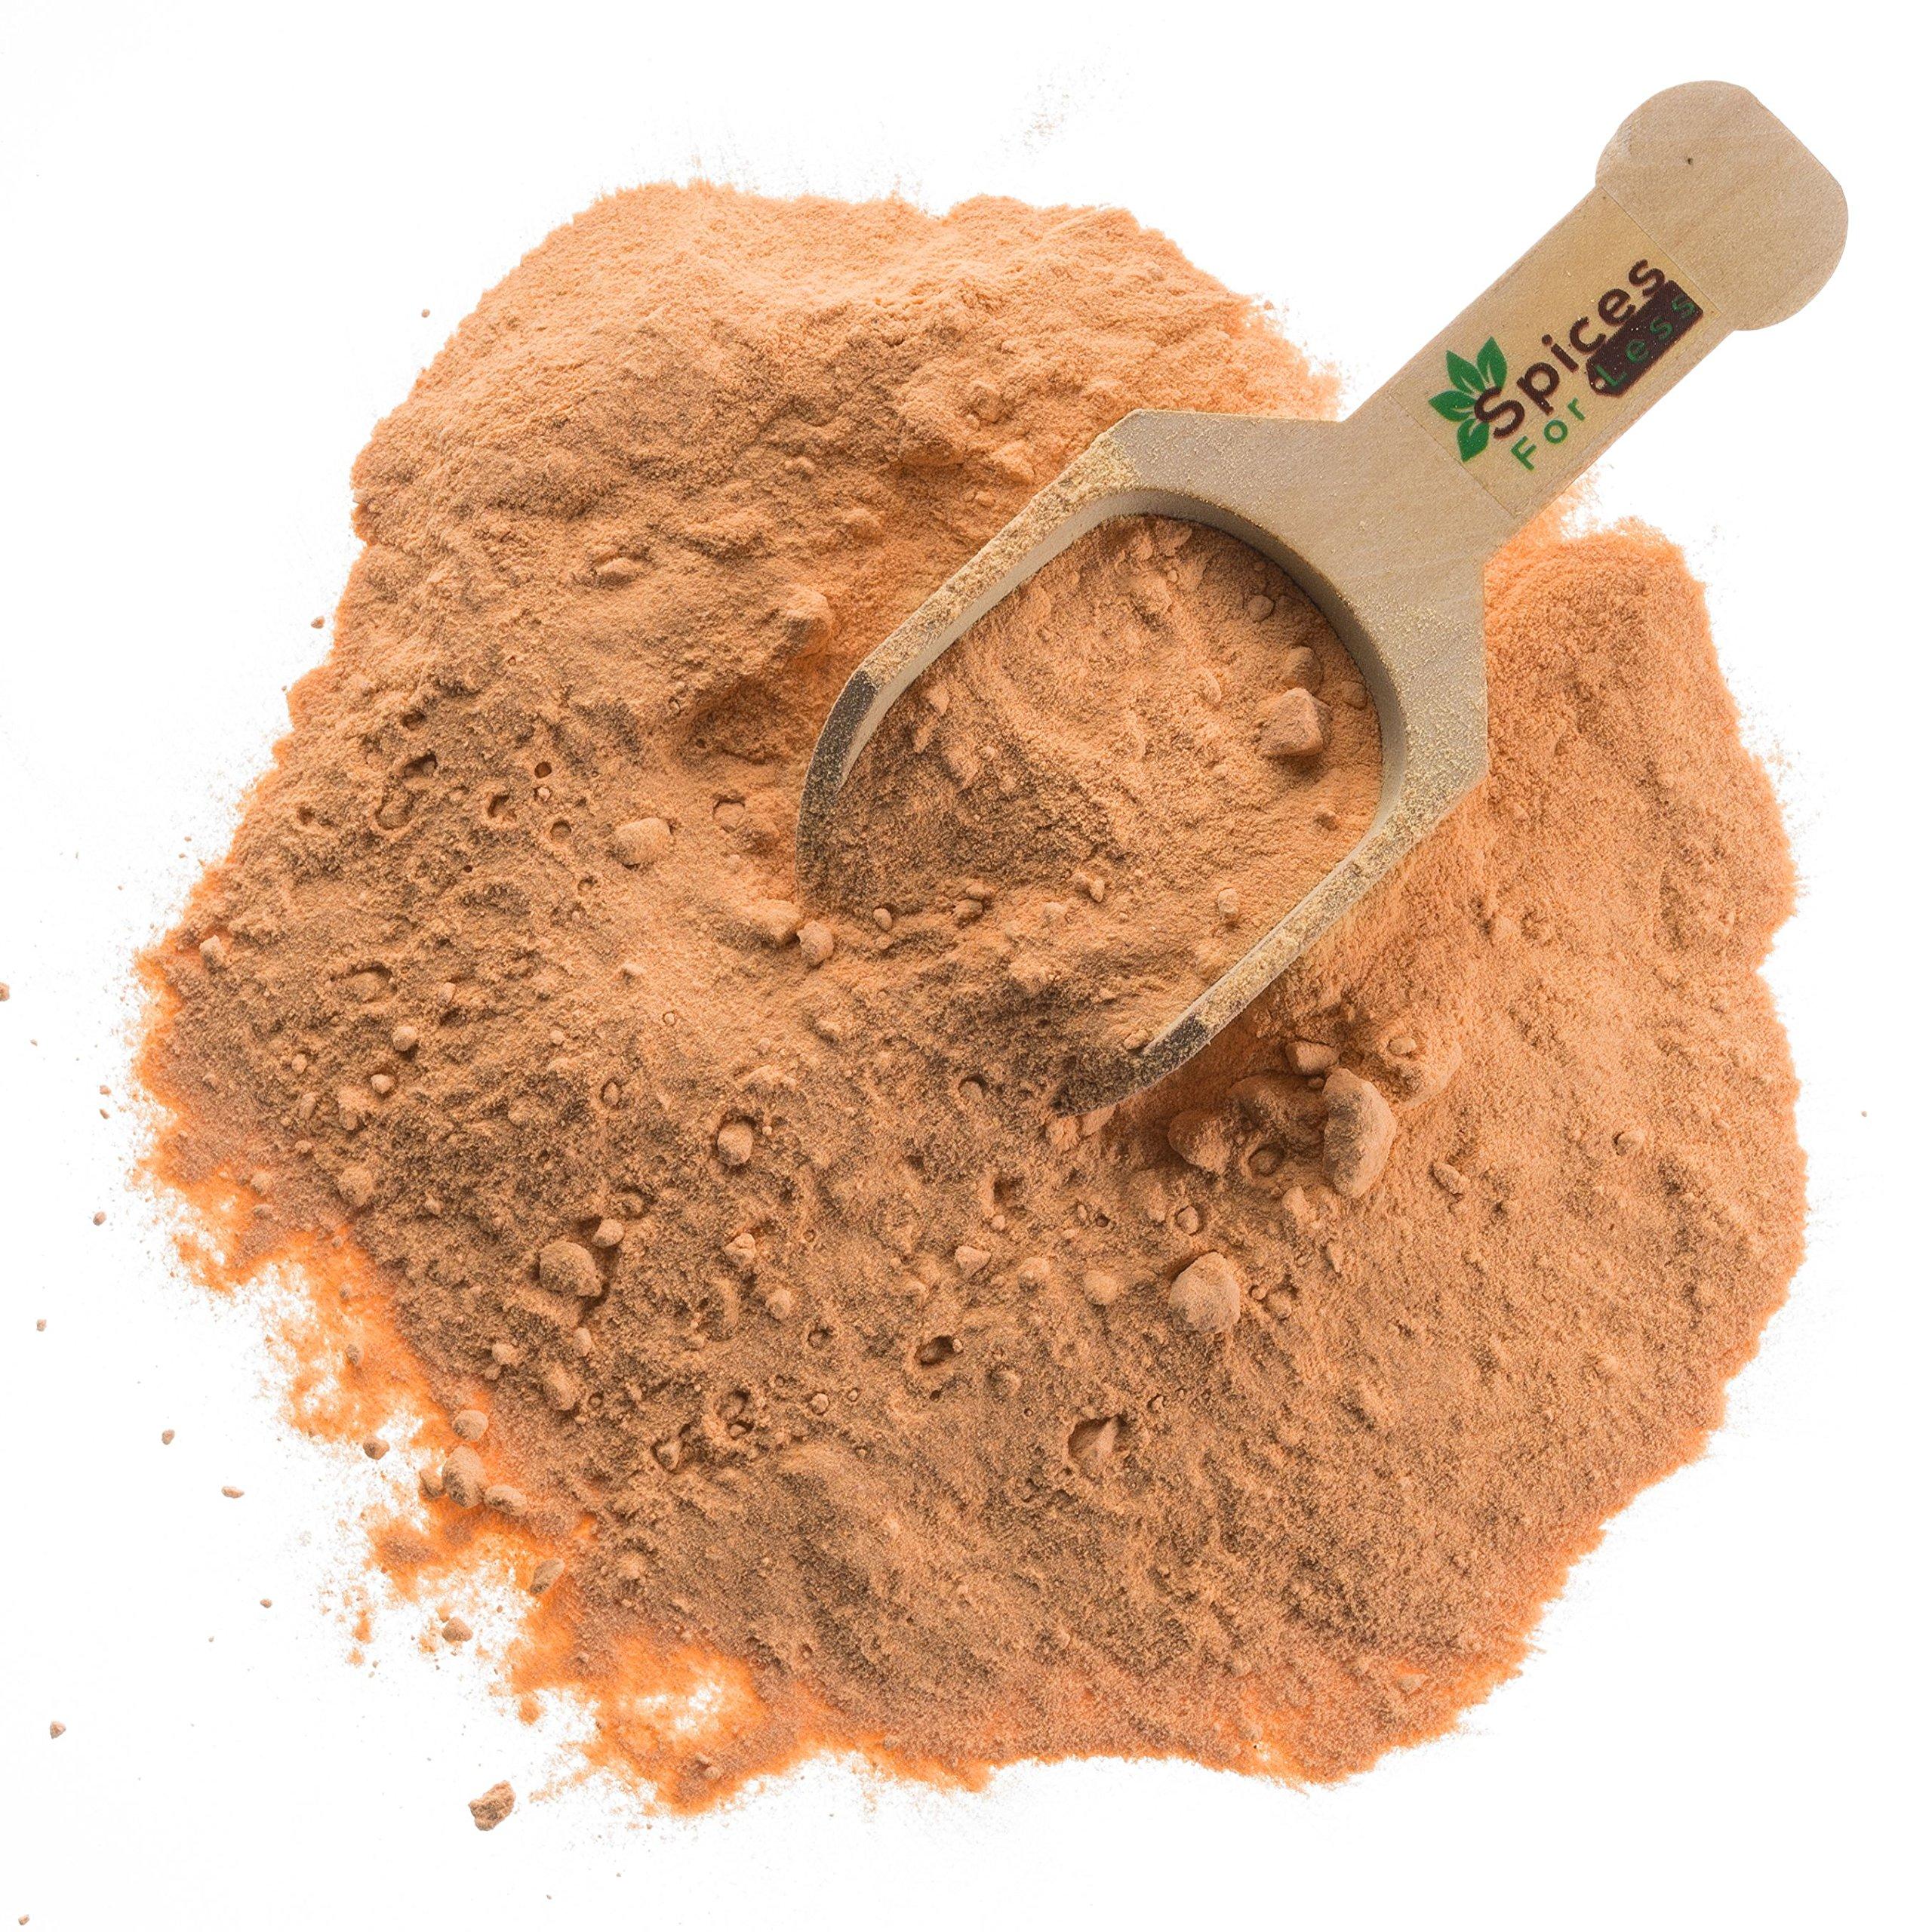 SFL Carrot Powder - Resealable Bag - Kosher - Premium Quality (5 LBS)